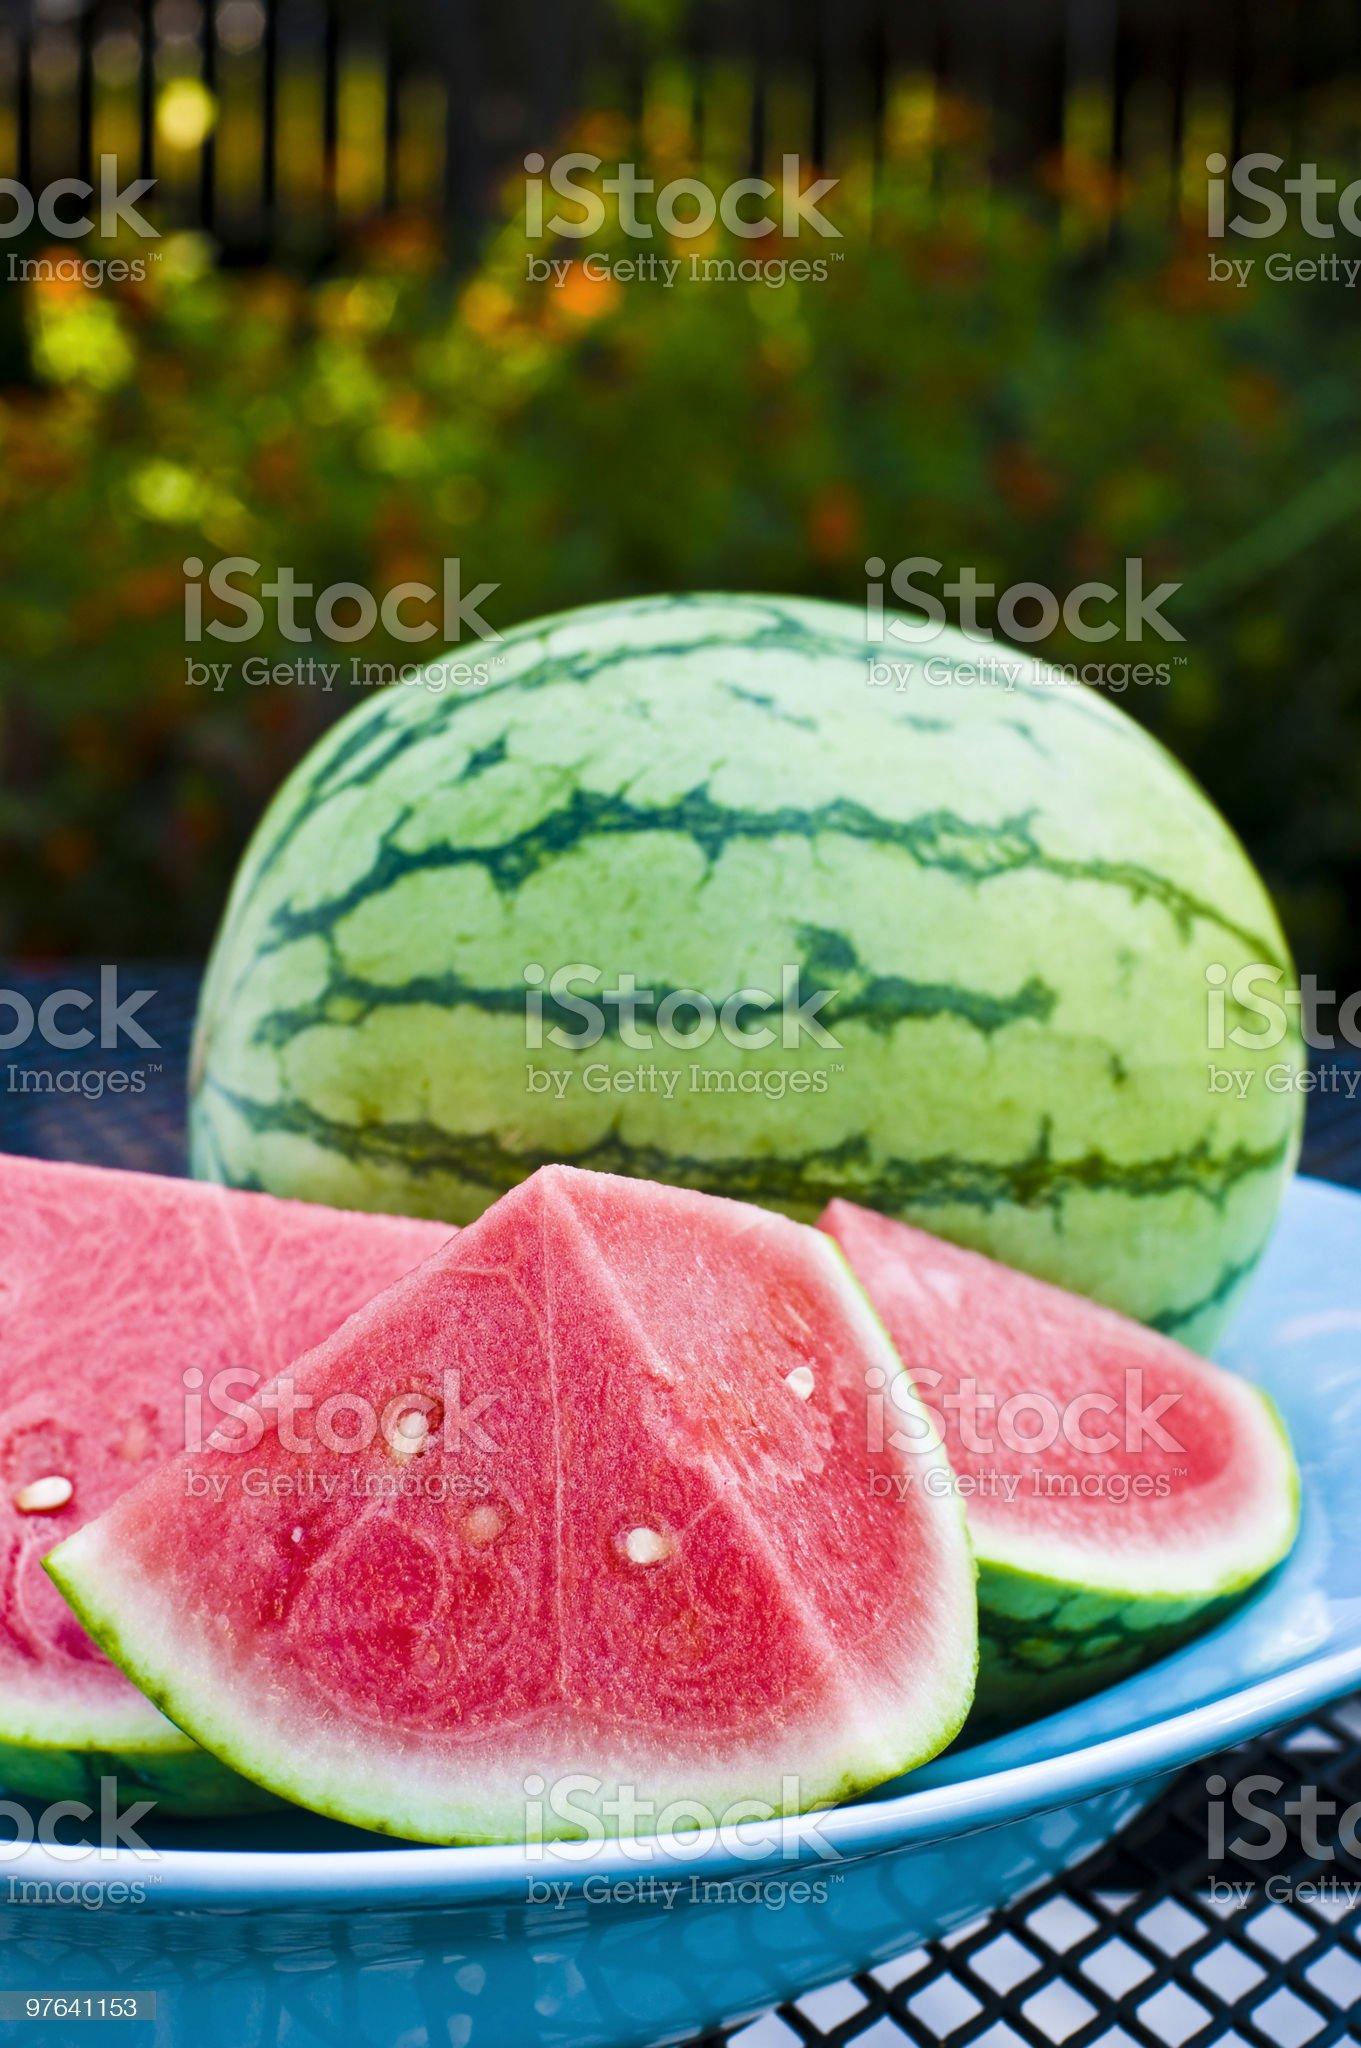 Watermelon slices royalty-free stock photo